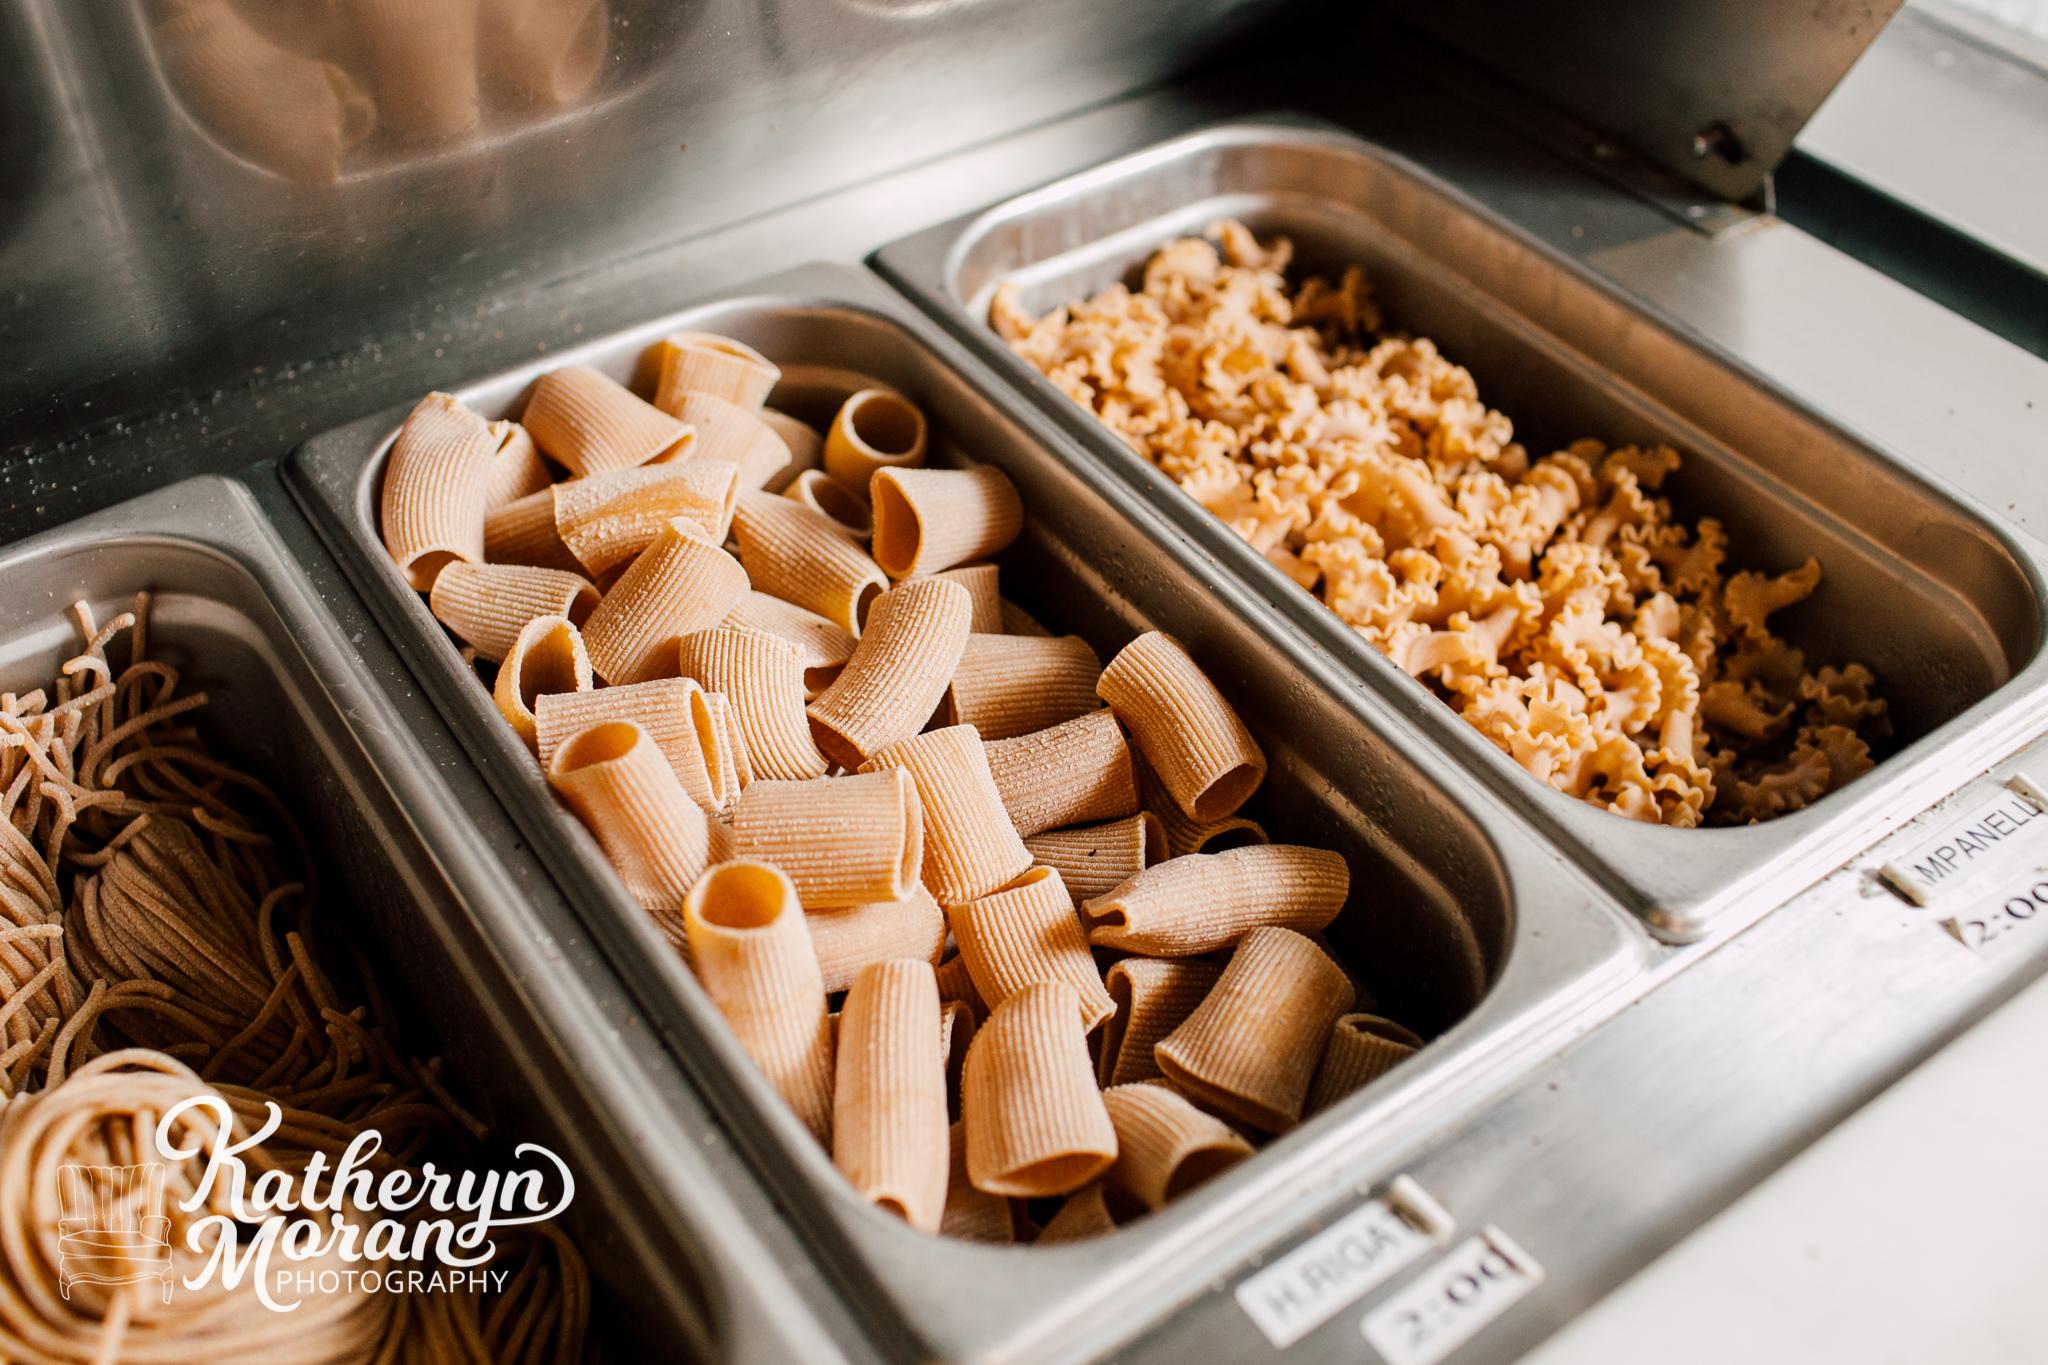 seattle-food-photographer-katheryn-moran-due-cucina-italiana-2.jpg